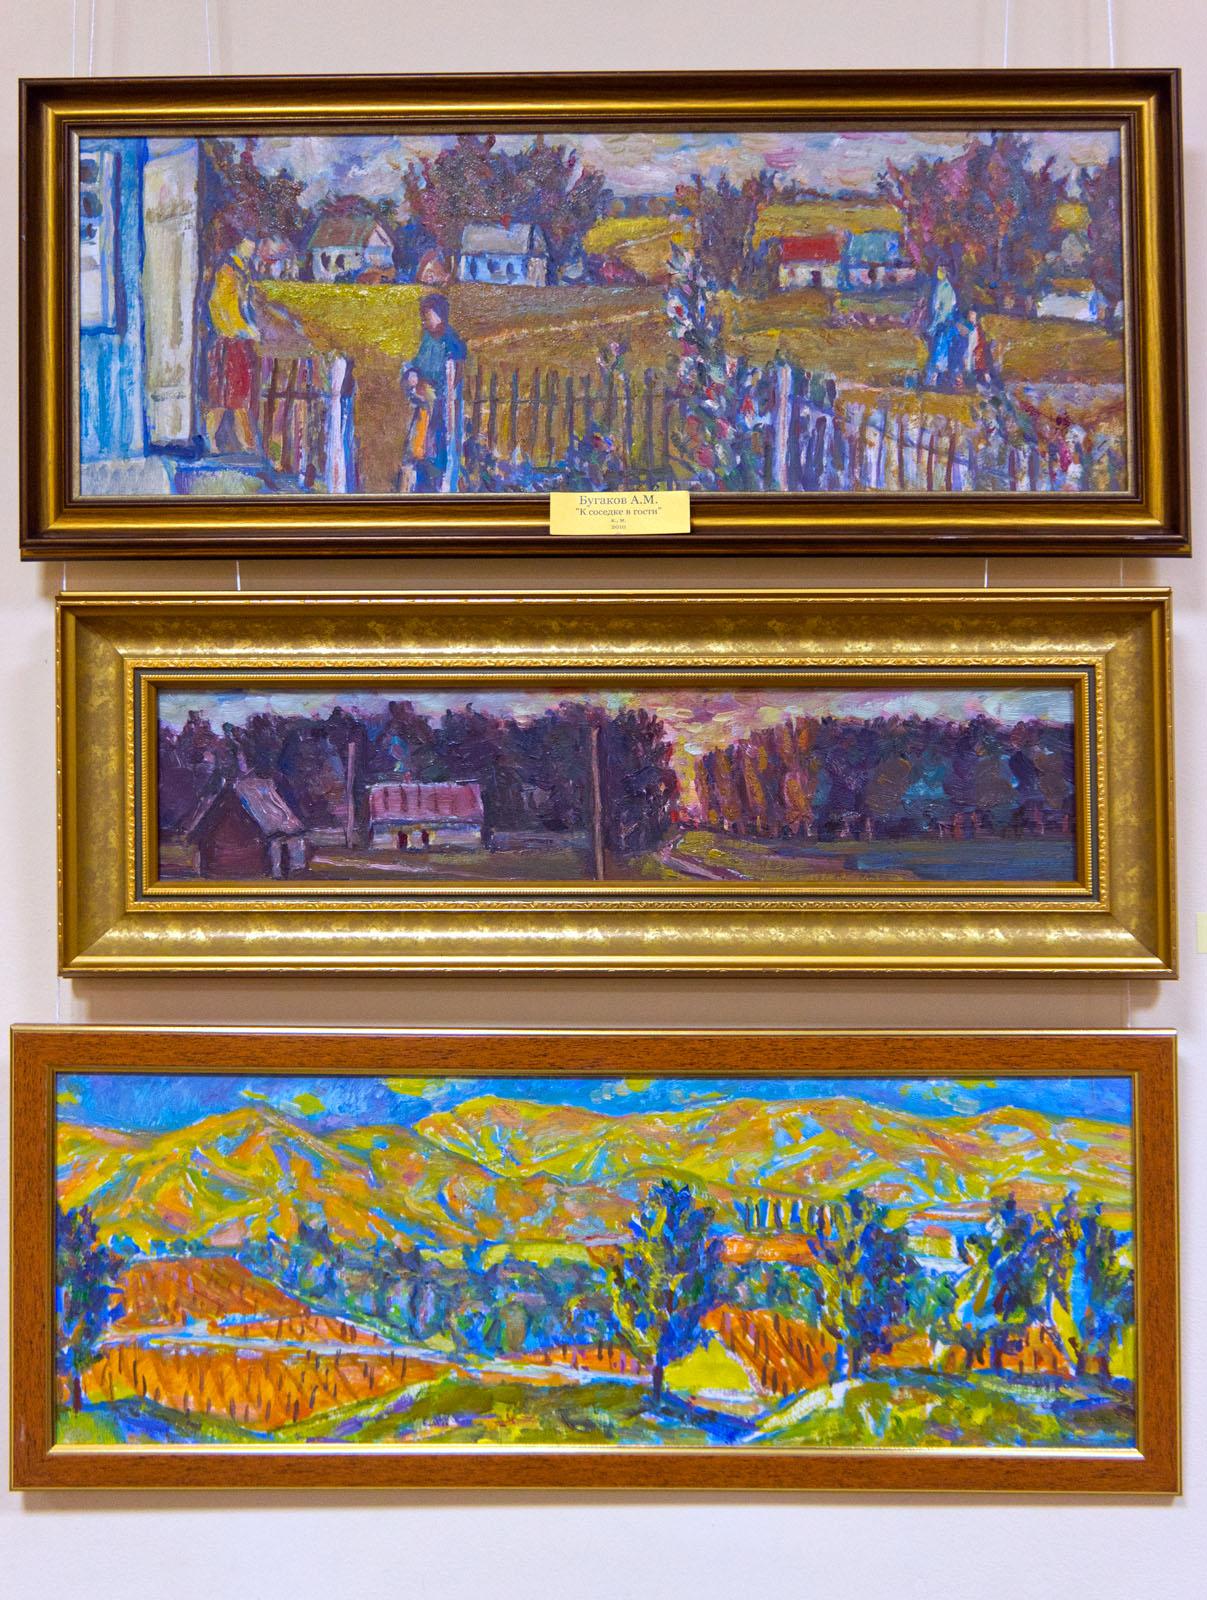 Фото №69193. Фрагмент экспозиции. Анатолий Бугаков